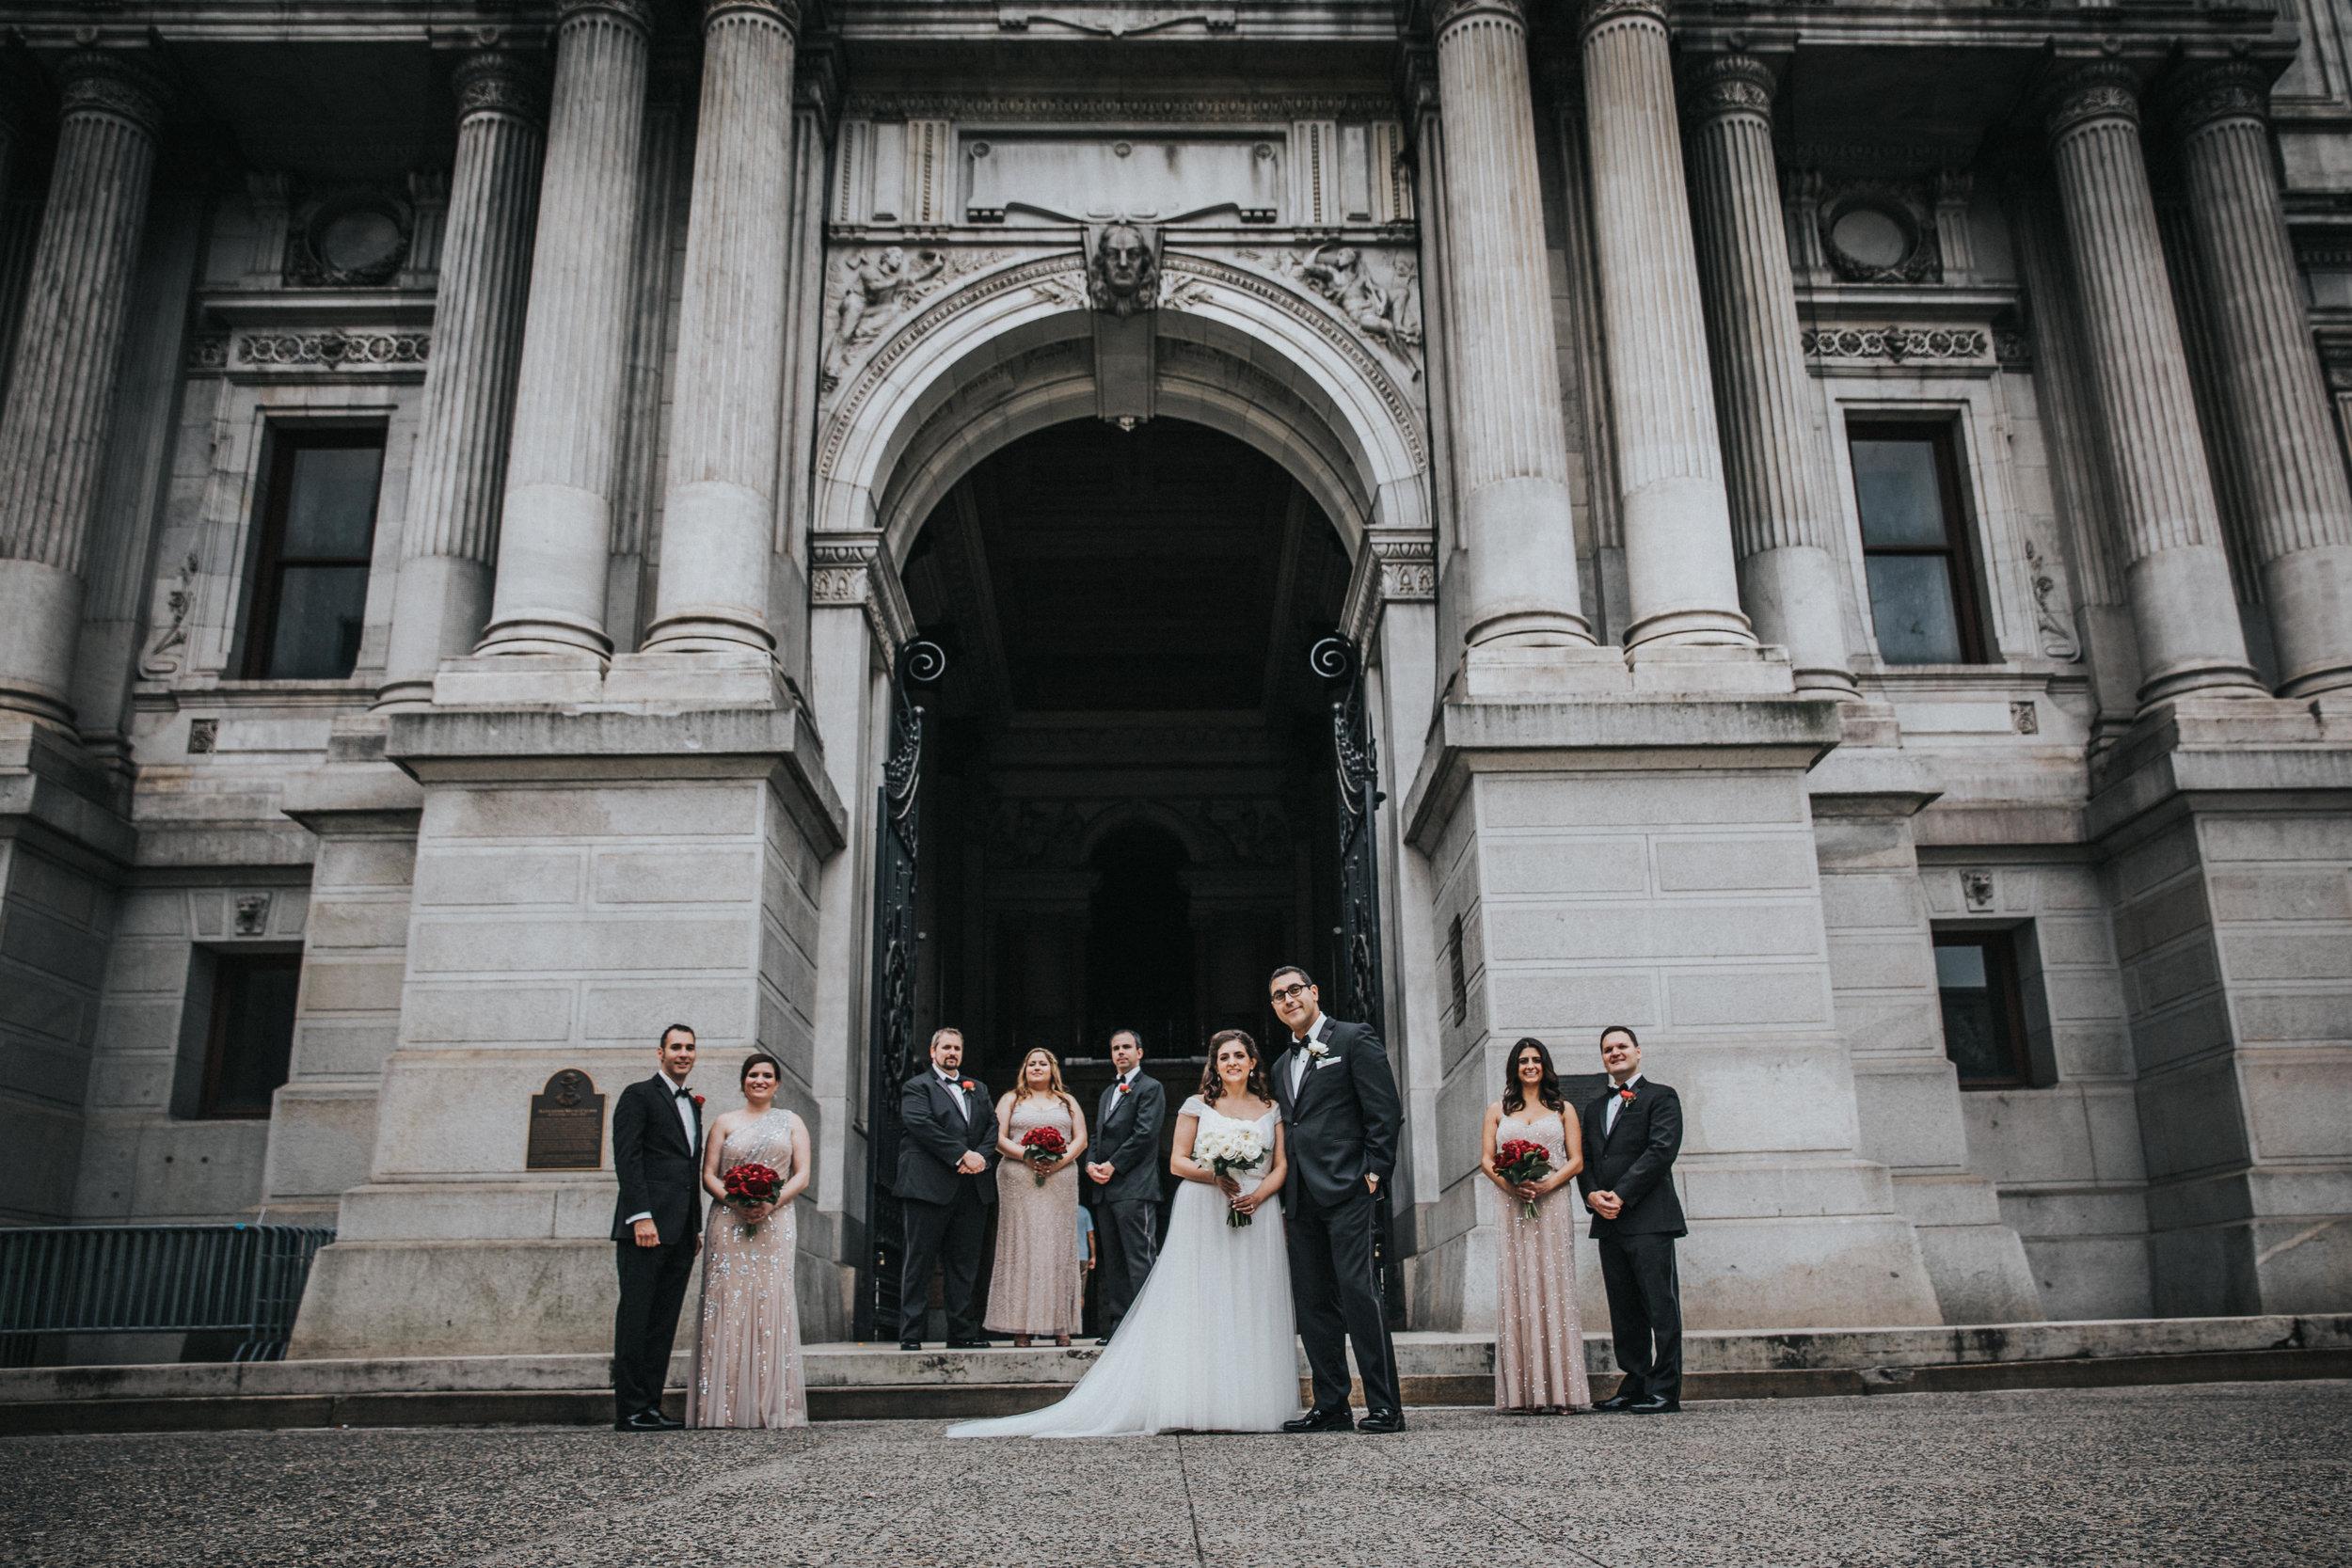 JennaLynnPhotography-NJWeddingPhotographer-Philadelphia-Wedding-ArtsBallroom-BridalParty-7.jpg